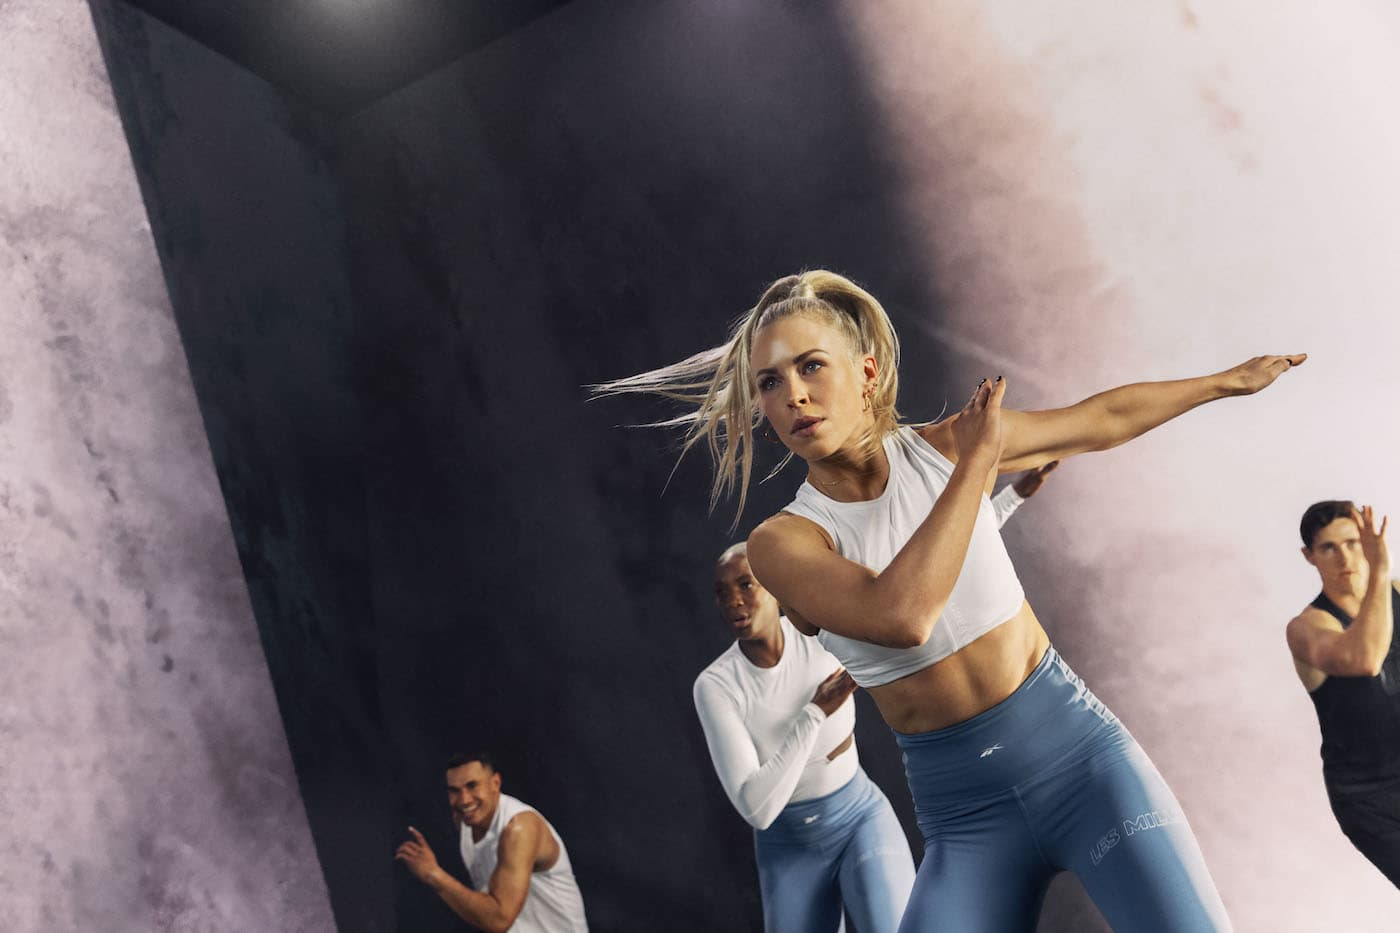 2021 Les Mills Global Fitness Report